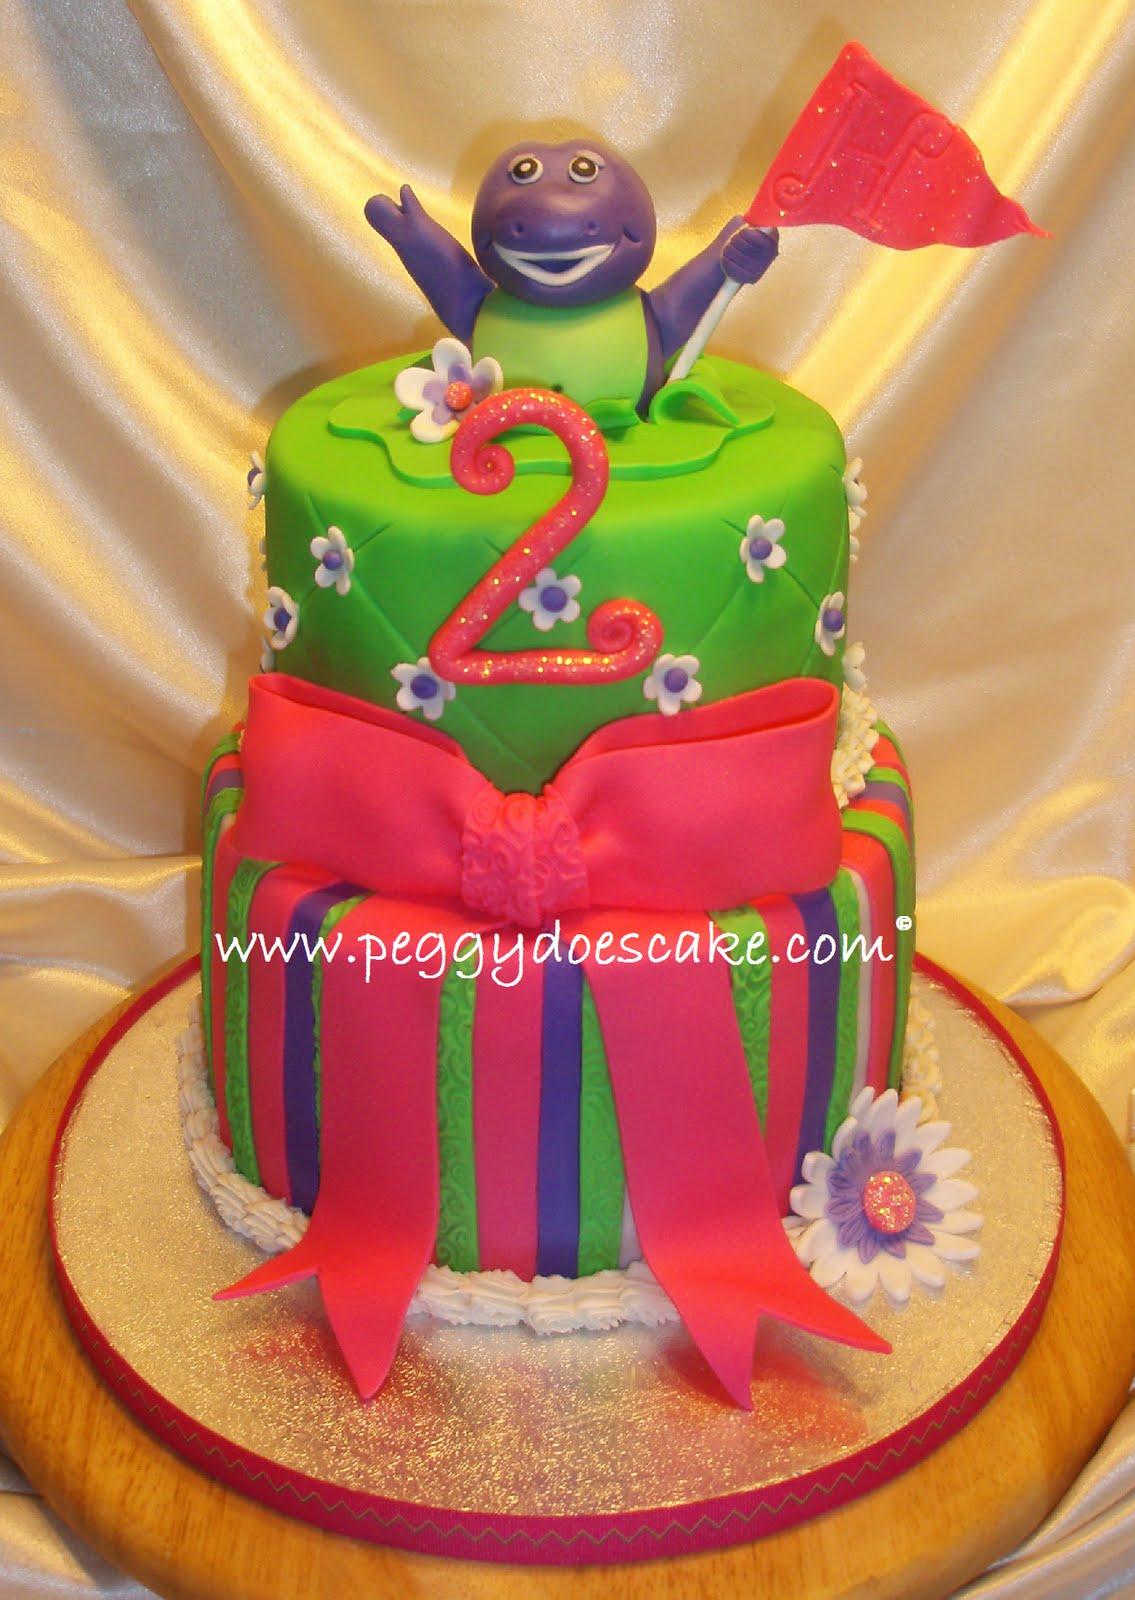 barney cake - photo #21